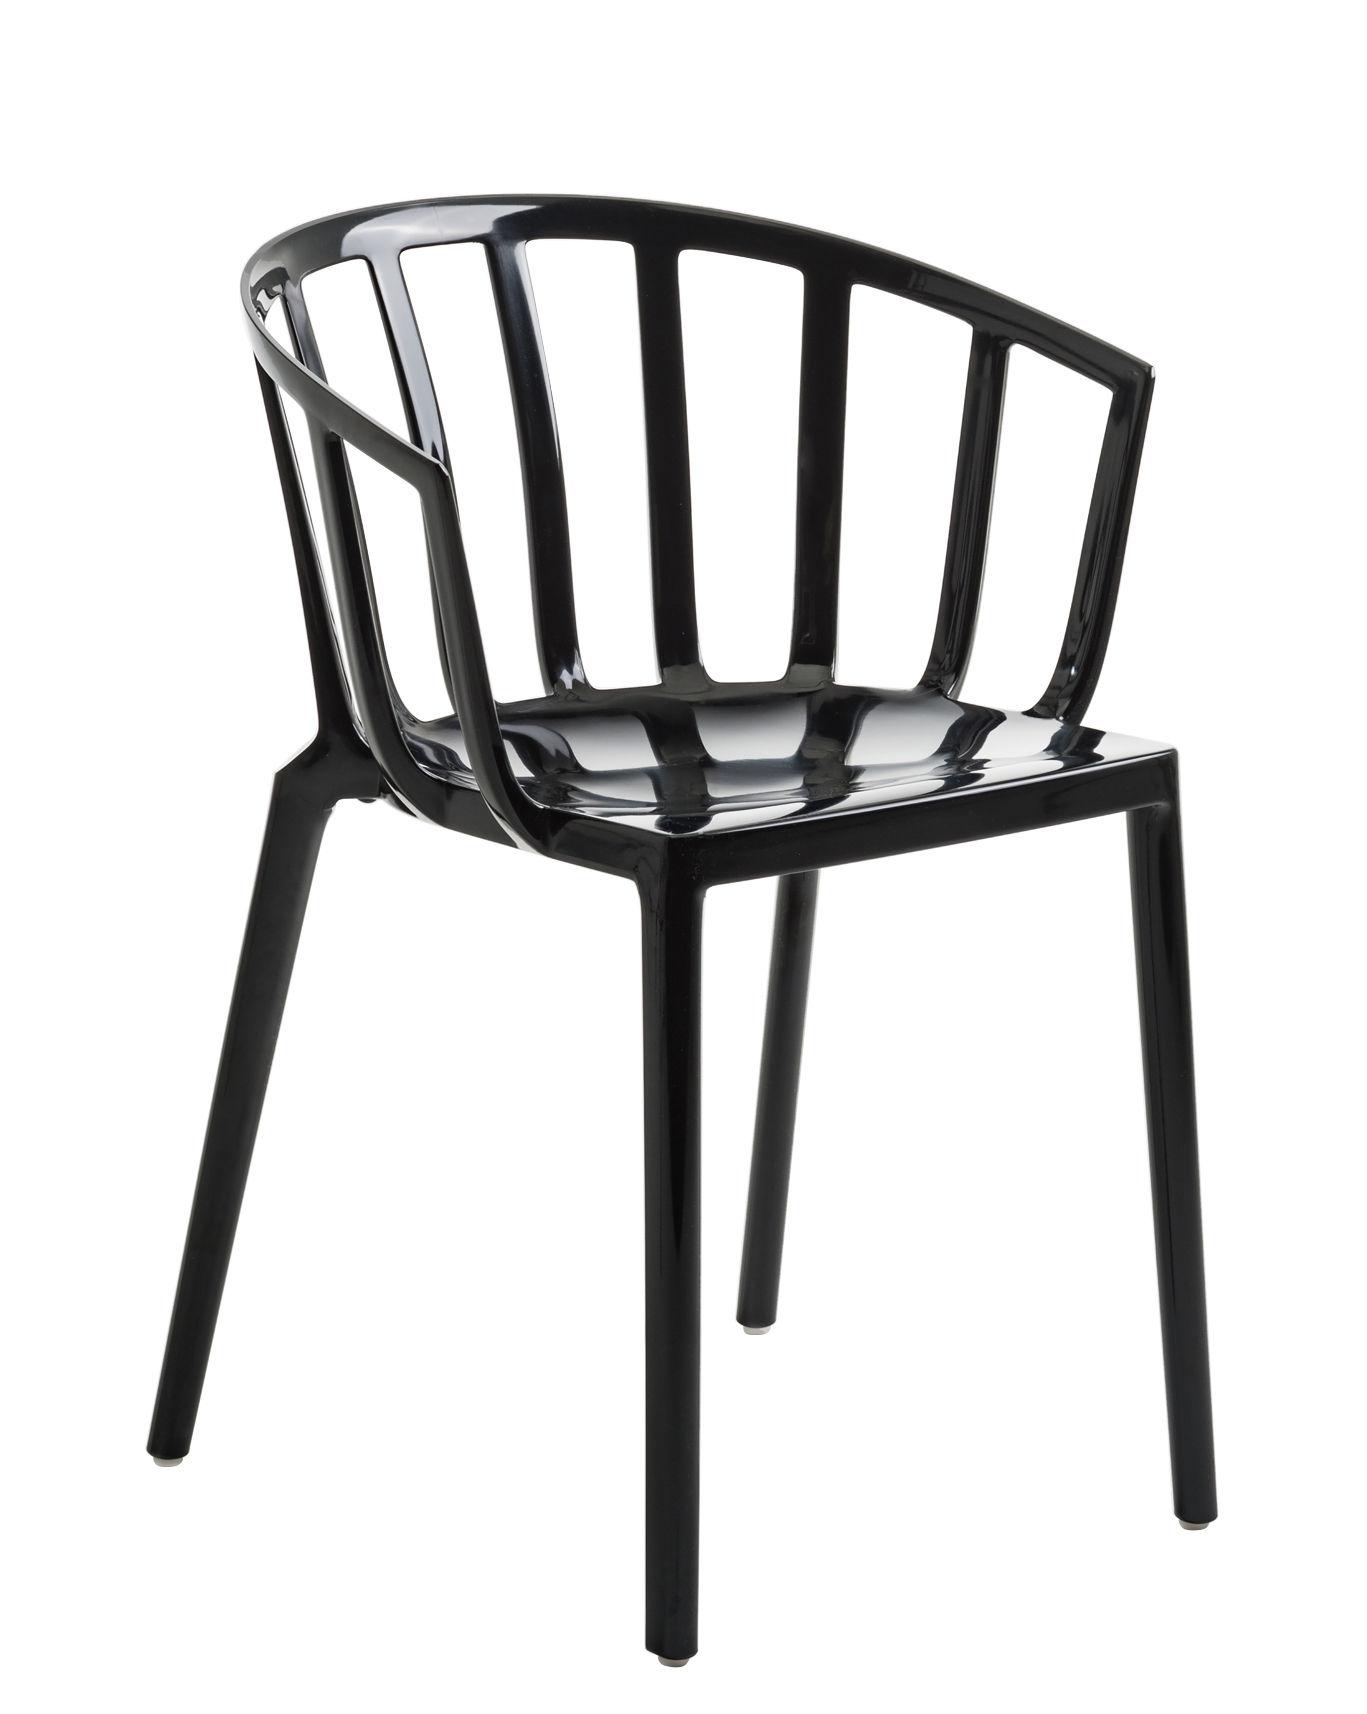 Möbel - Stühle  - Generic AC Venice Stapelbarer Sessel / Polykarbonat - Kartell - Schwarz - Polykarbonat